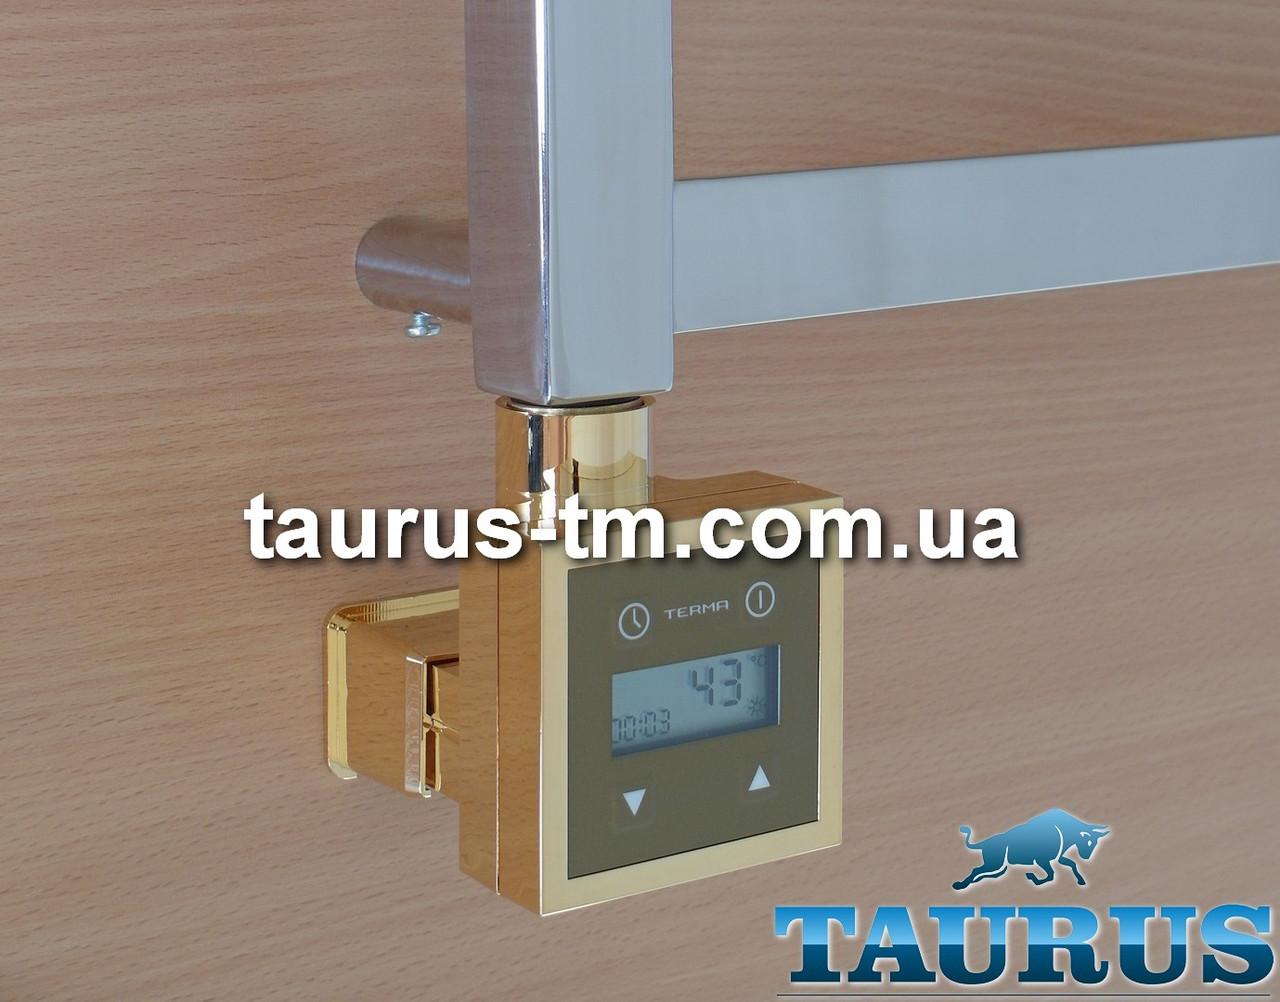 Золотой электроТЭН KTX3 MS Gold квадратный + маскировка, экран LCD, регулятор 30-60C, таймер 24 ч.; 120-1000W